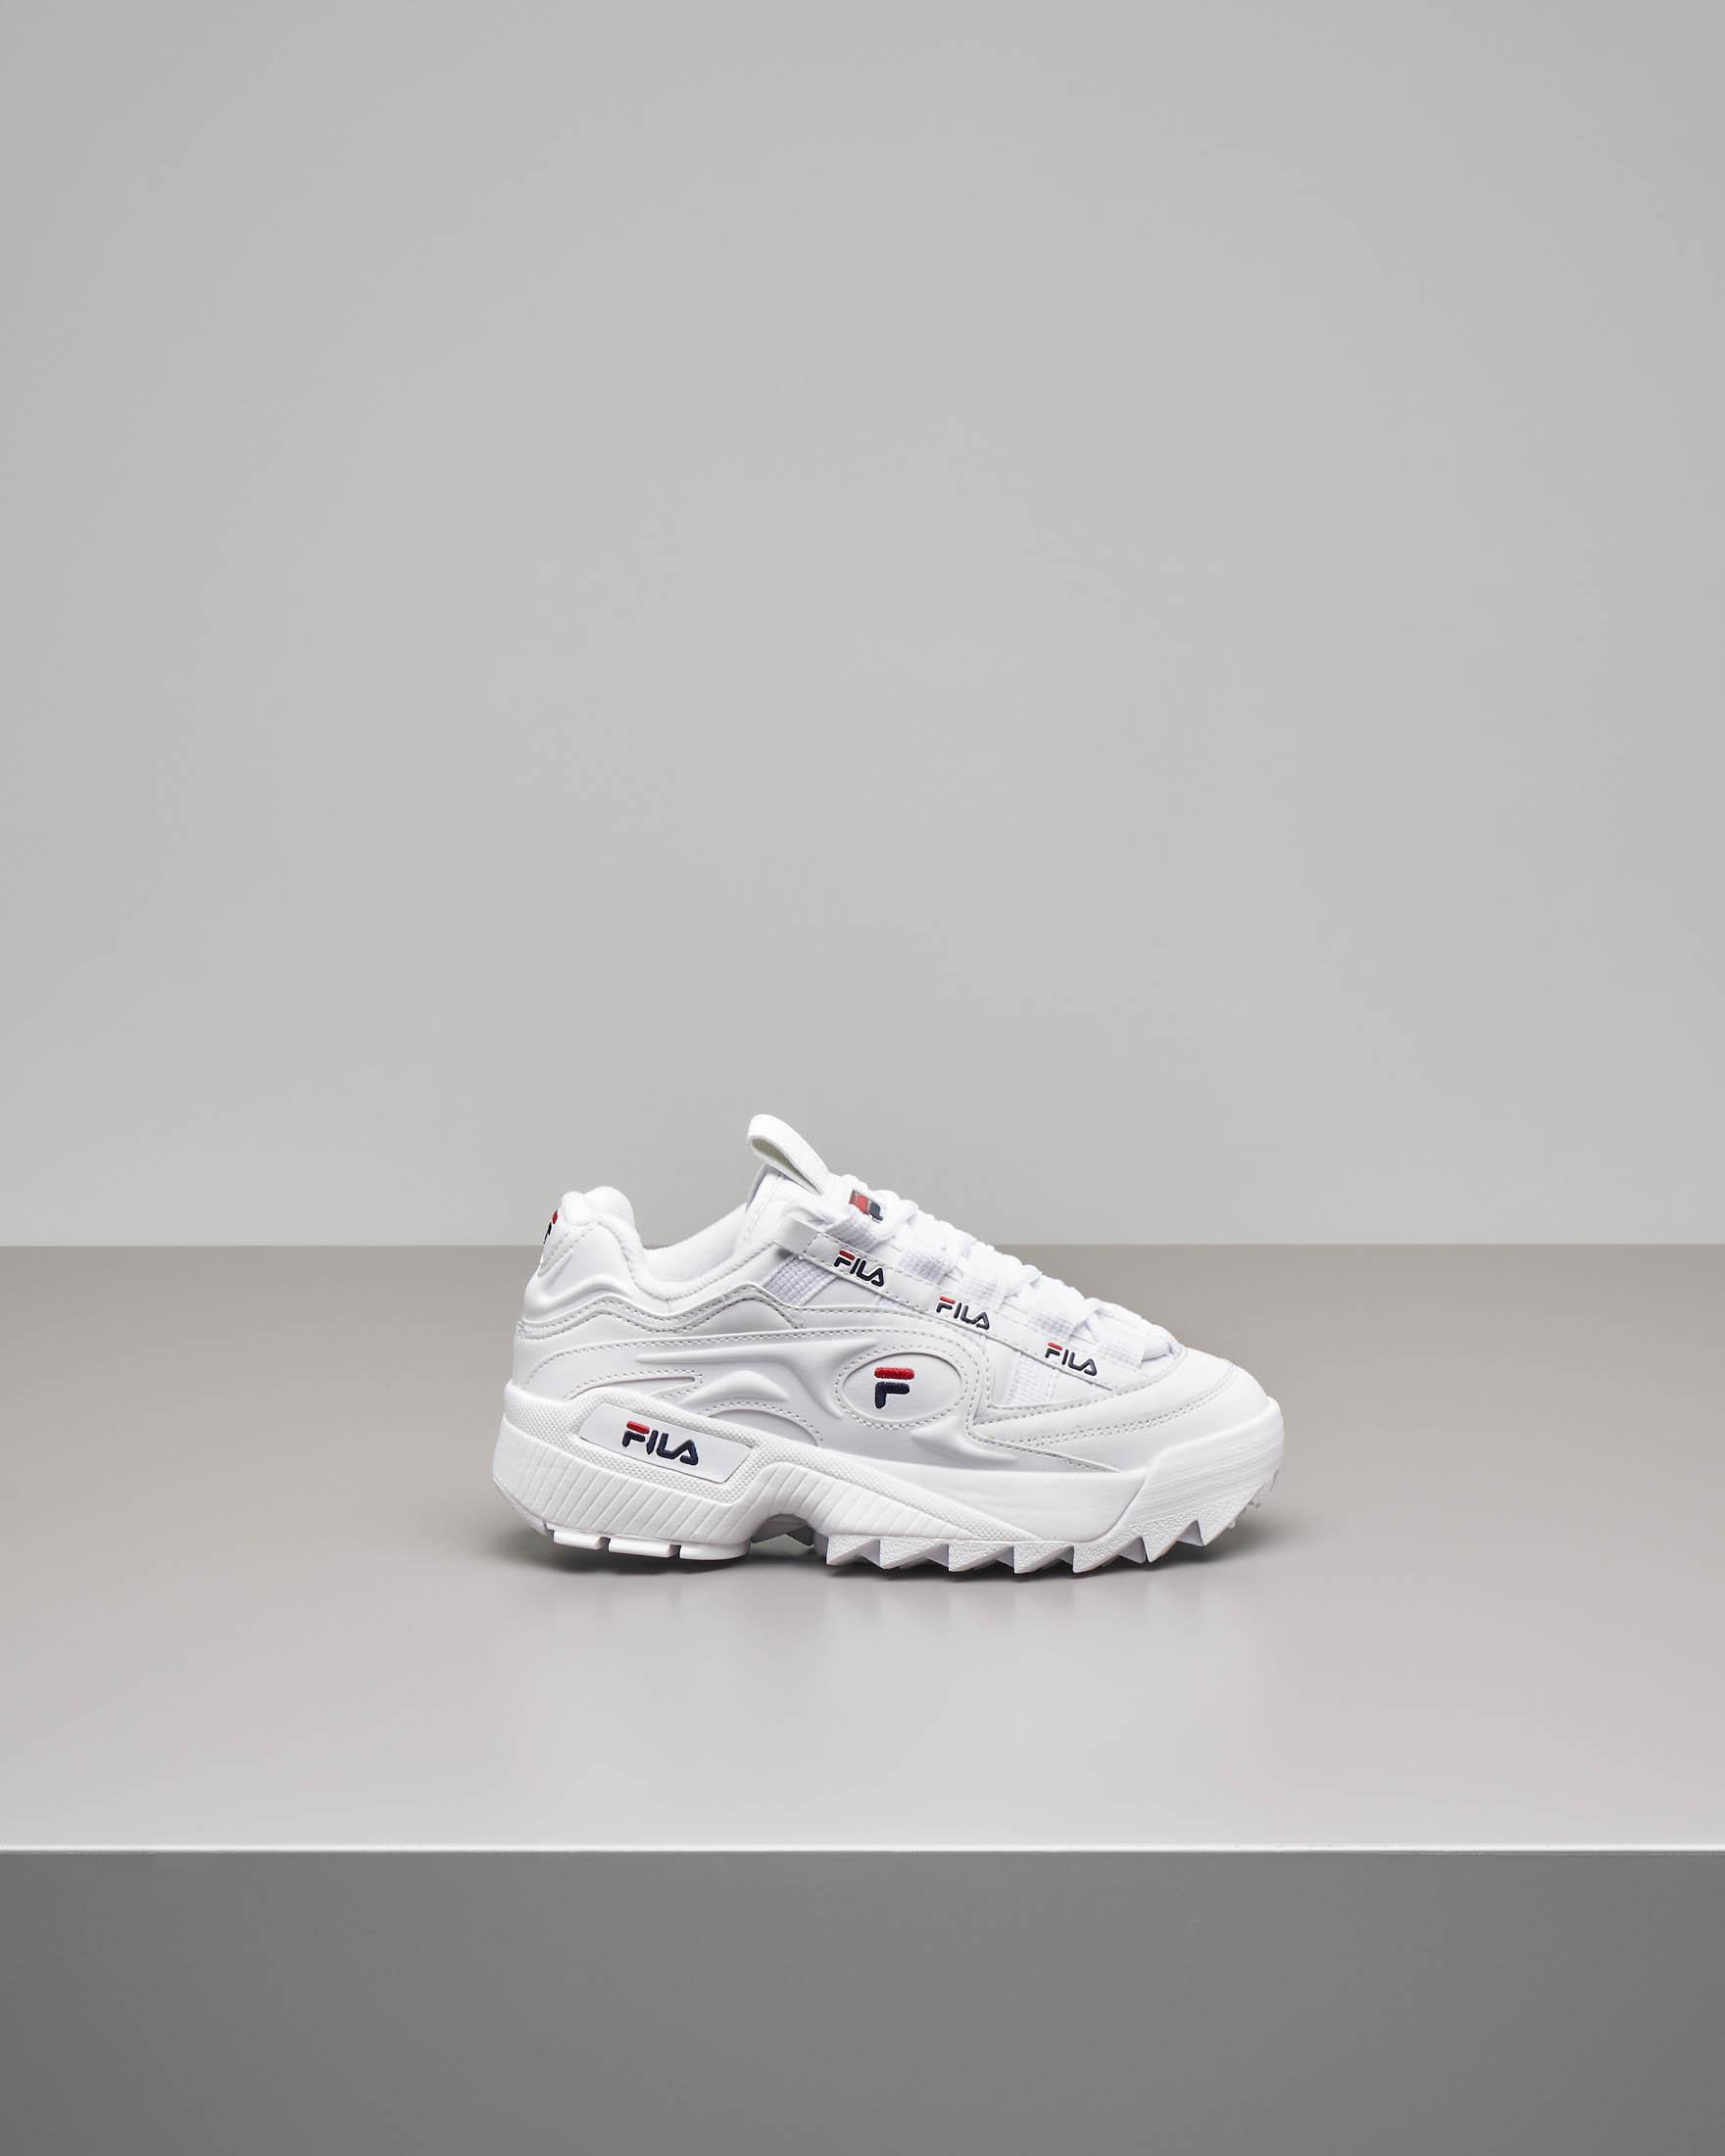 Sneaker Fila D-Formation bianche con rifiniture rosse e blu